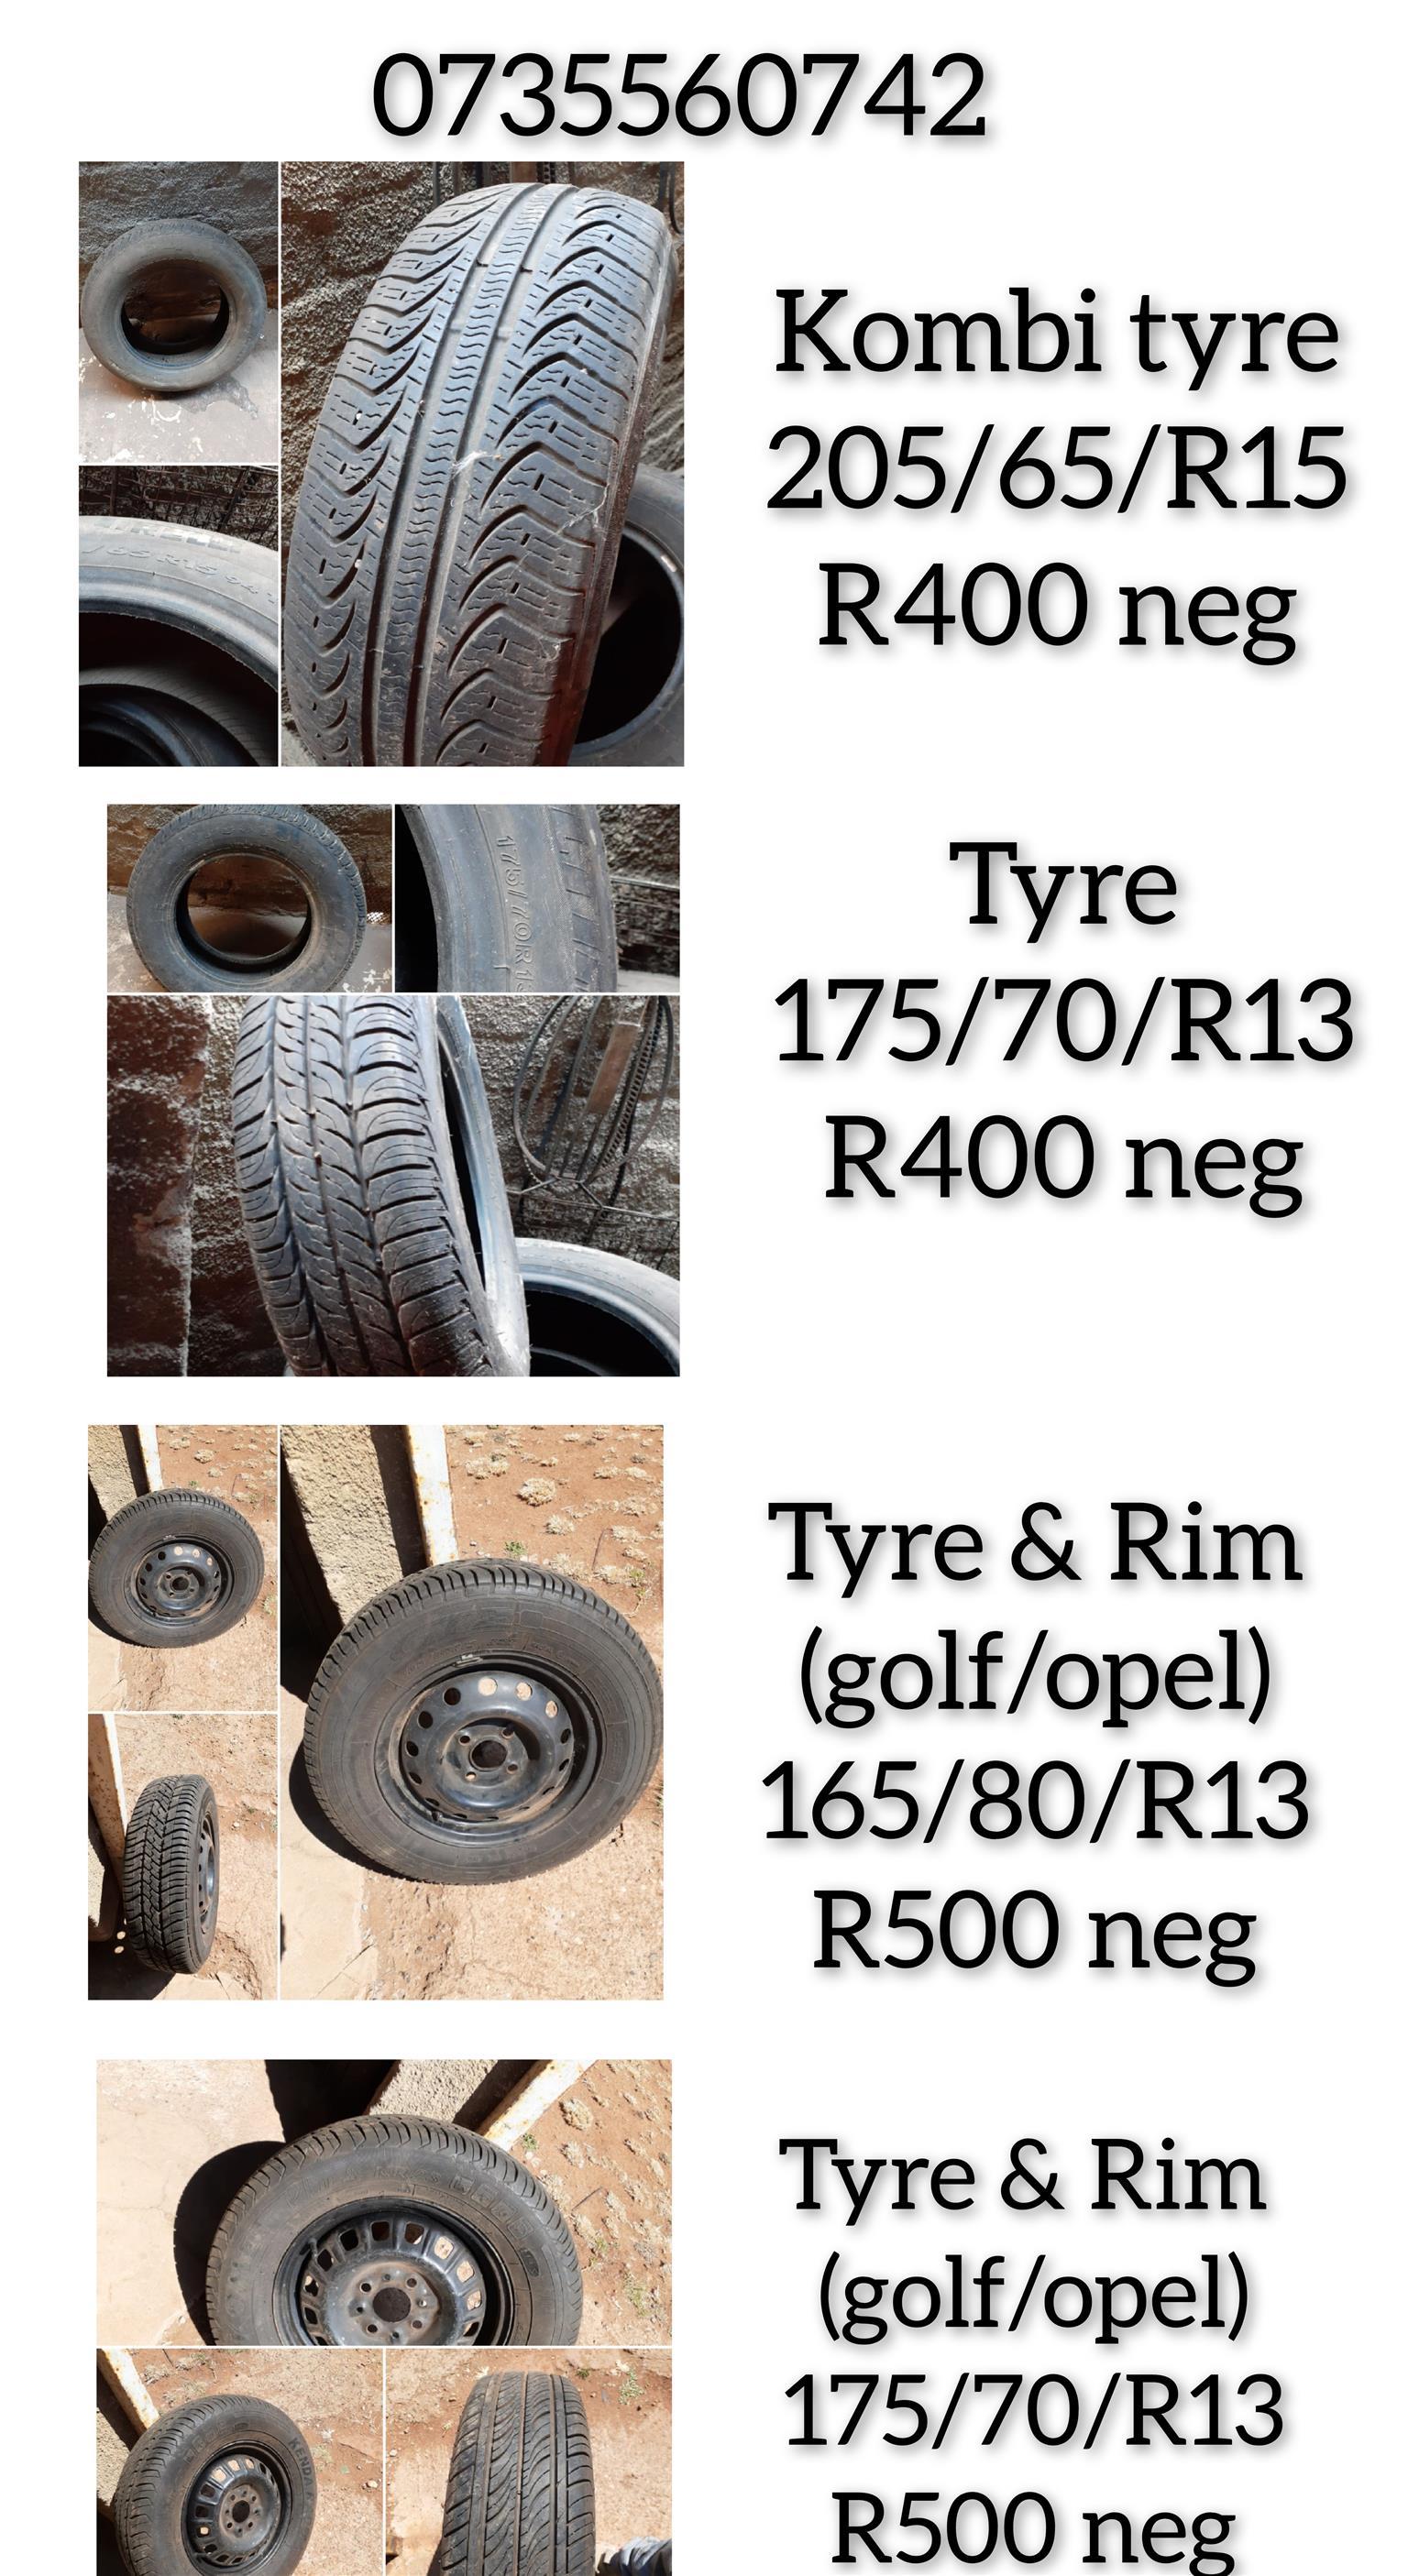 Various tyres